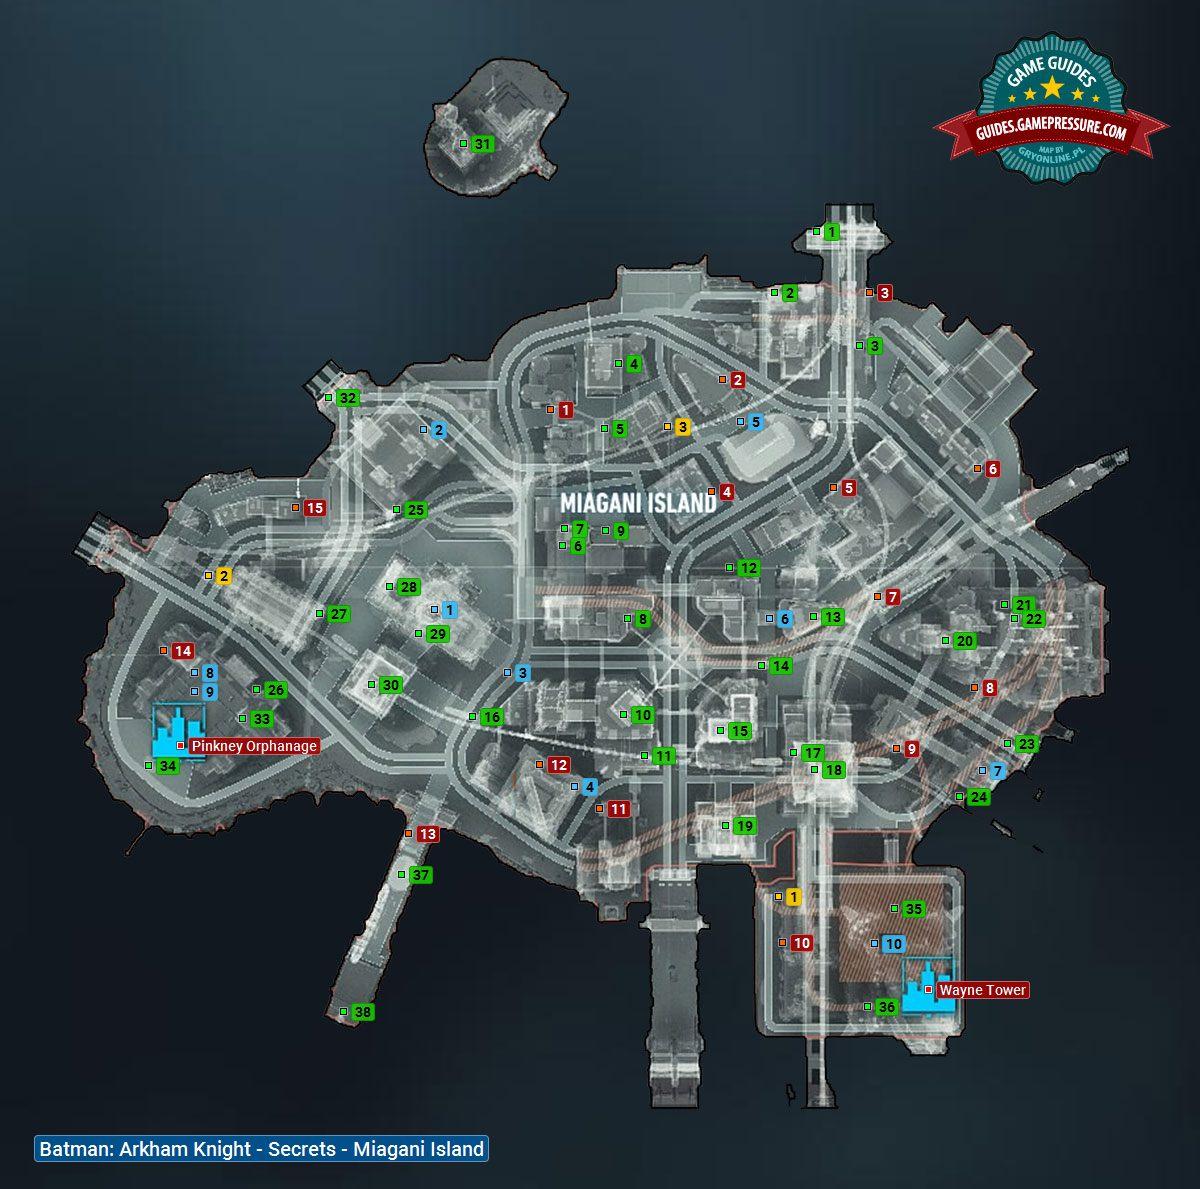 Founders Island Subway Map.Map Of Miagani Island Collectibles Miagani Island Batman